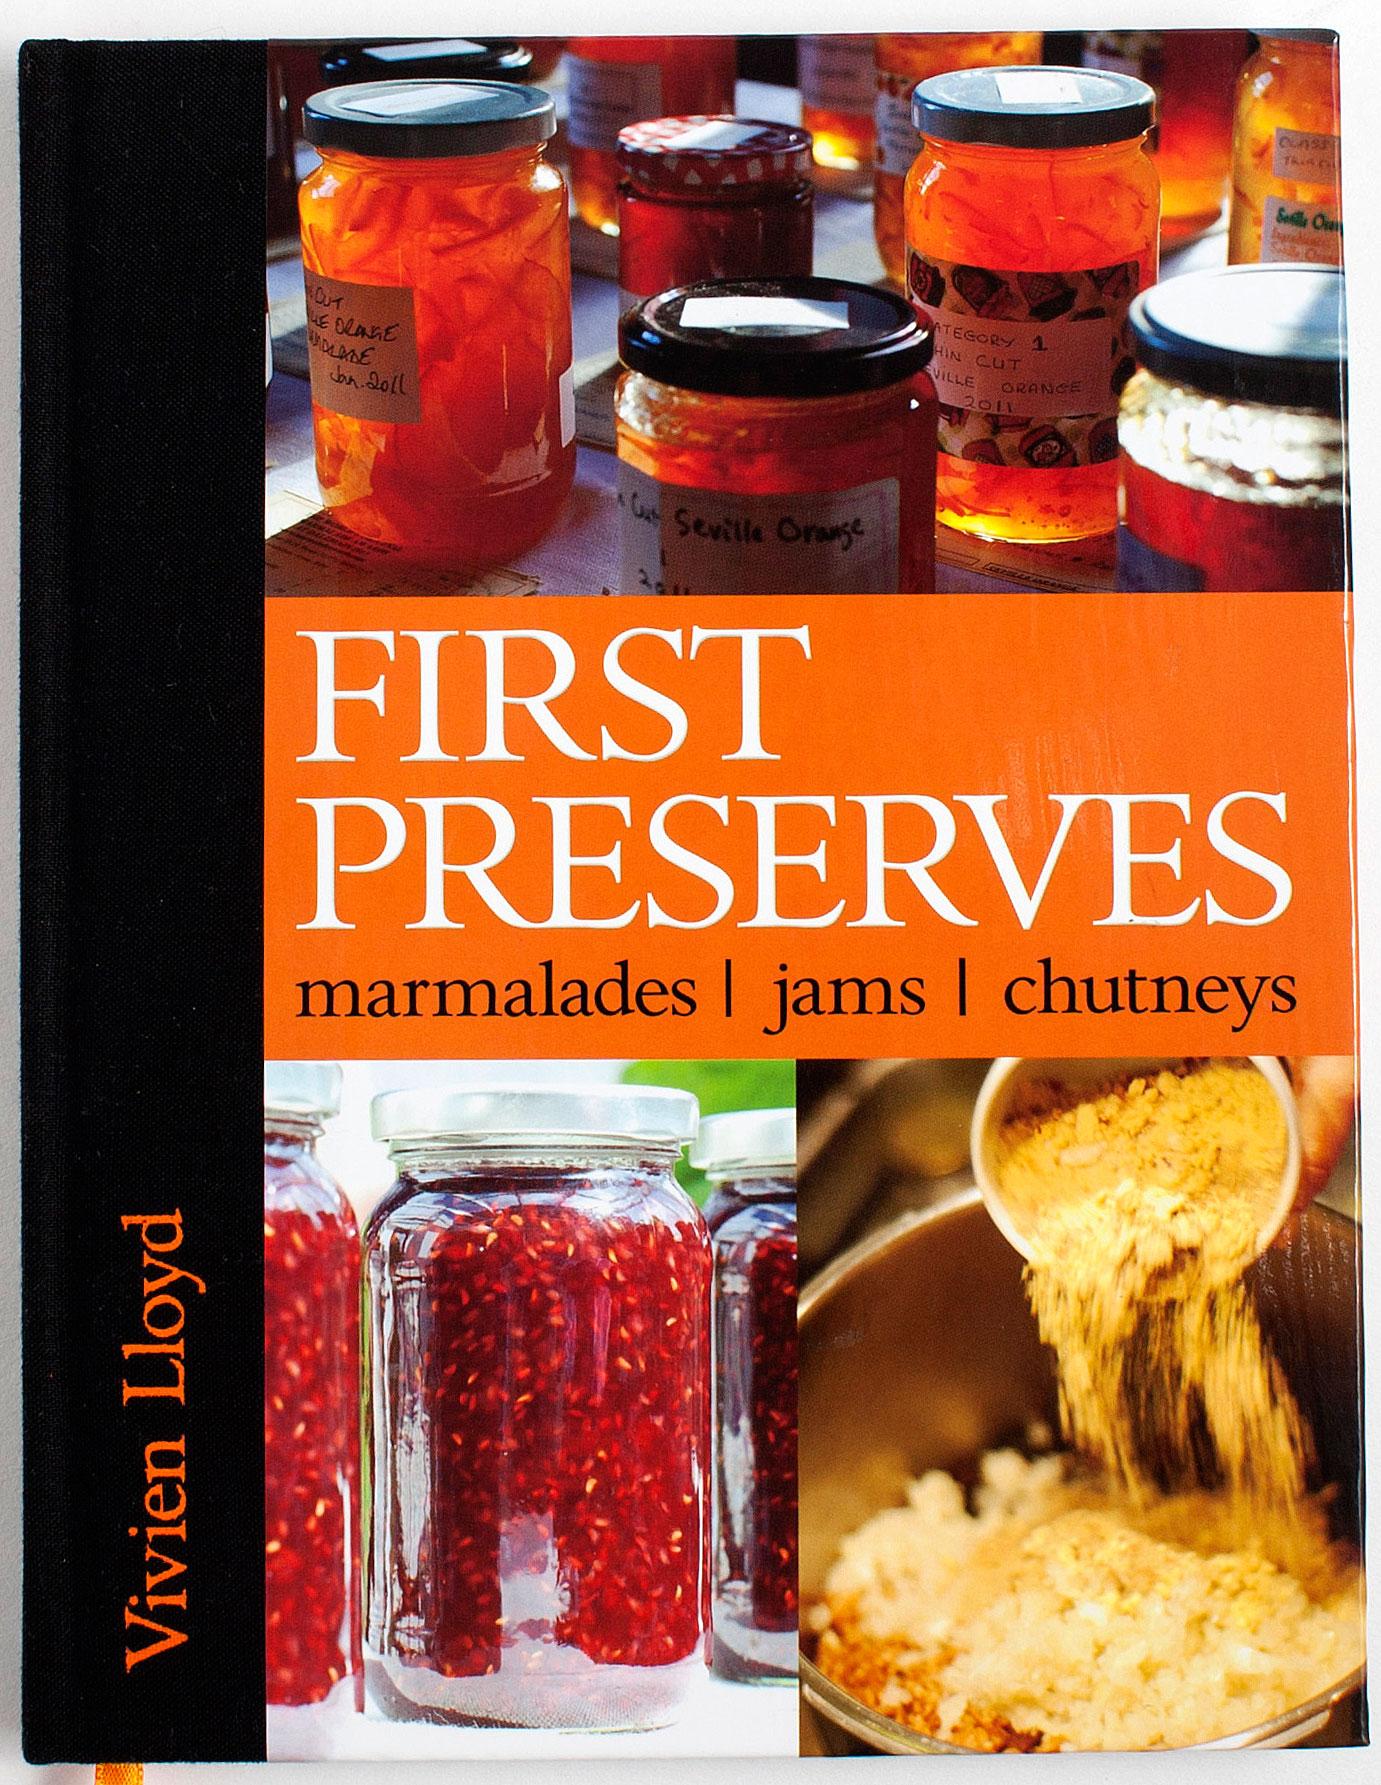 epm-print-management-cookery-books-2.jpg